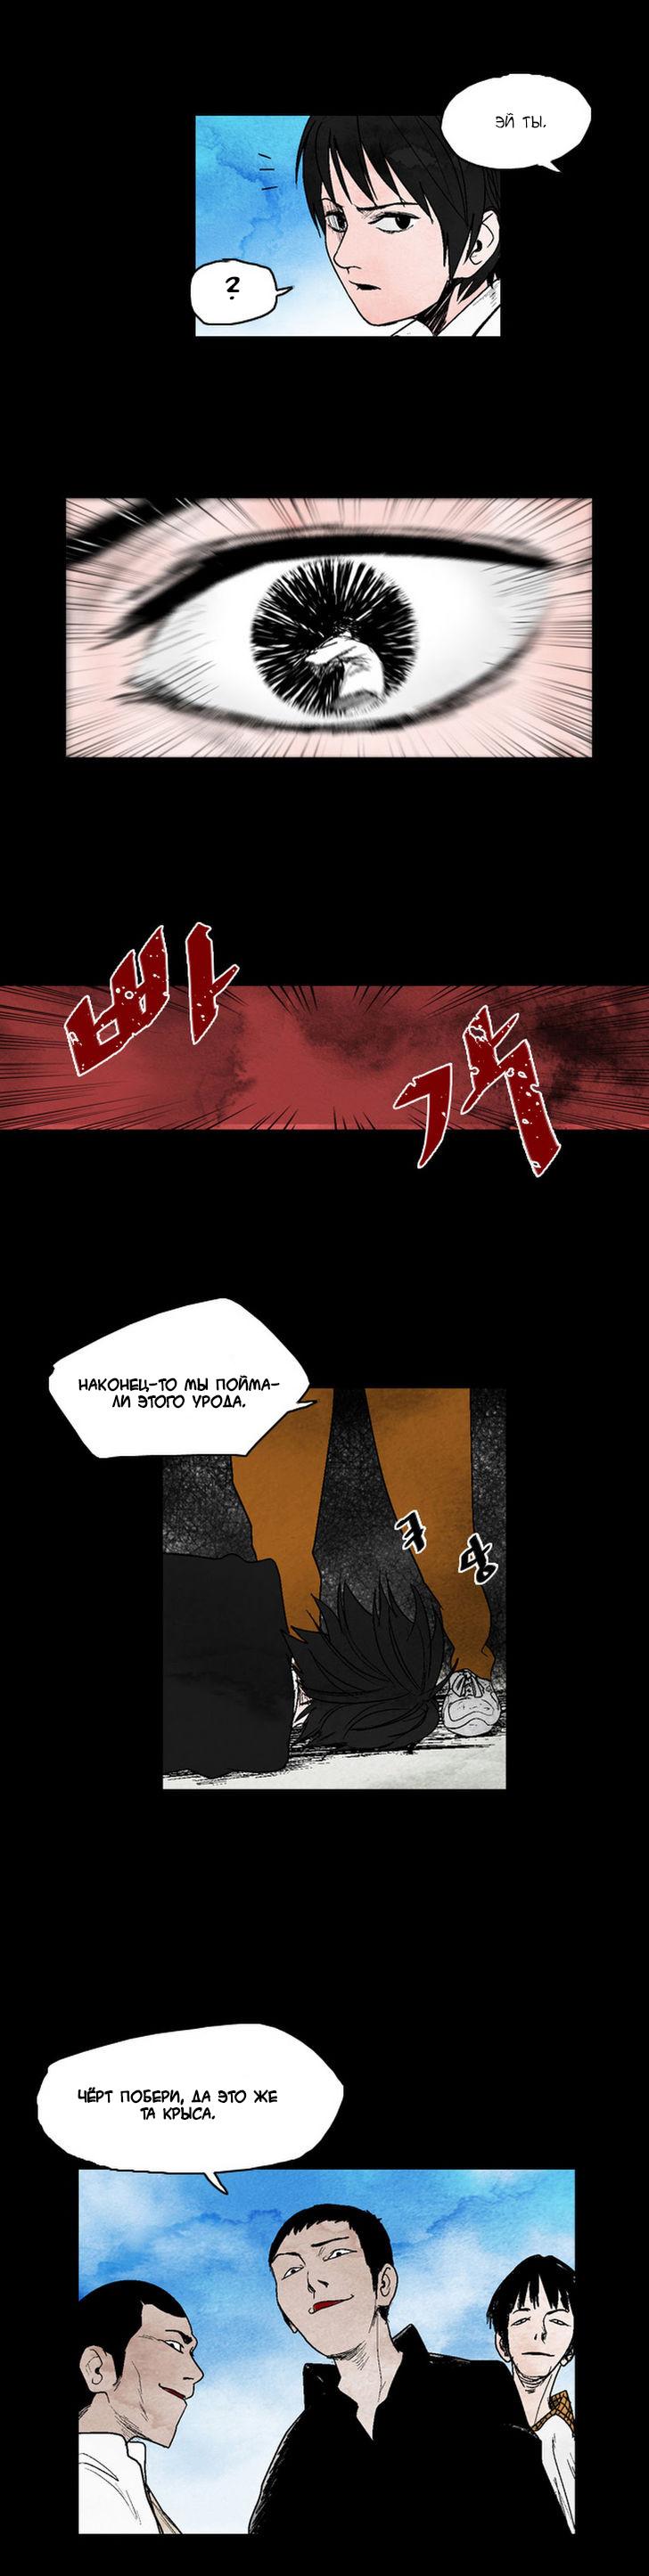 https://r1.ninemanga.com/comics/pic2/14/28302/409574/151928375179.jpg Page 9